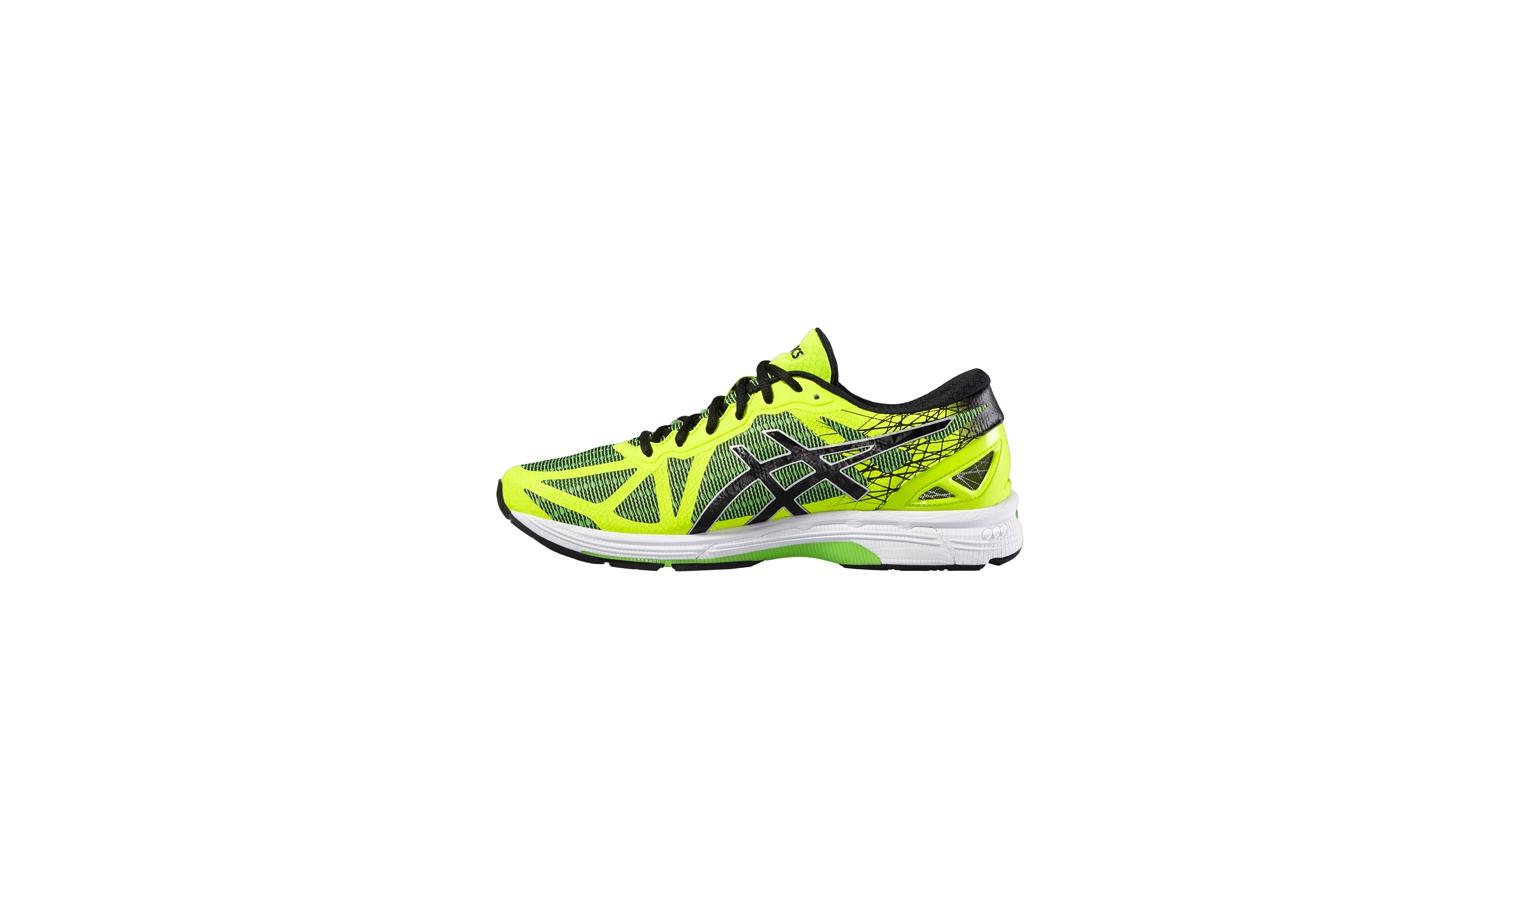 ... Pánske bežecké topánky Asics GEL-DS TRAINER 21 NC žlté. 0 EUR 6db1e7832ce